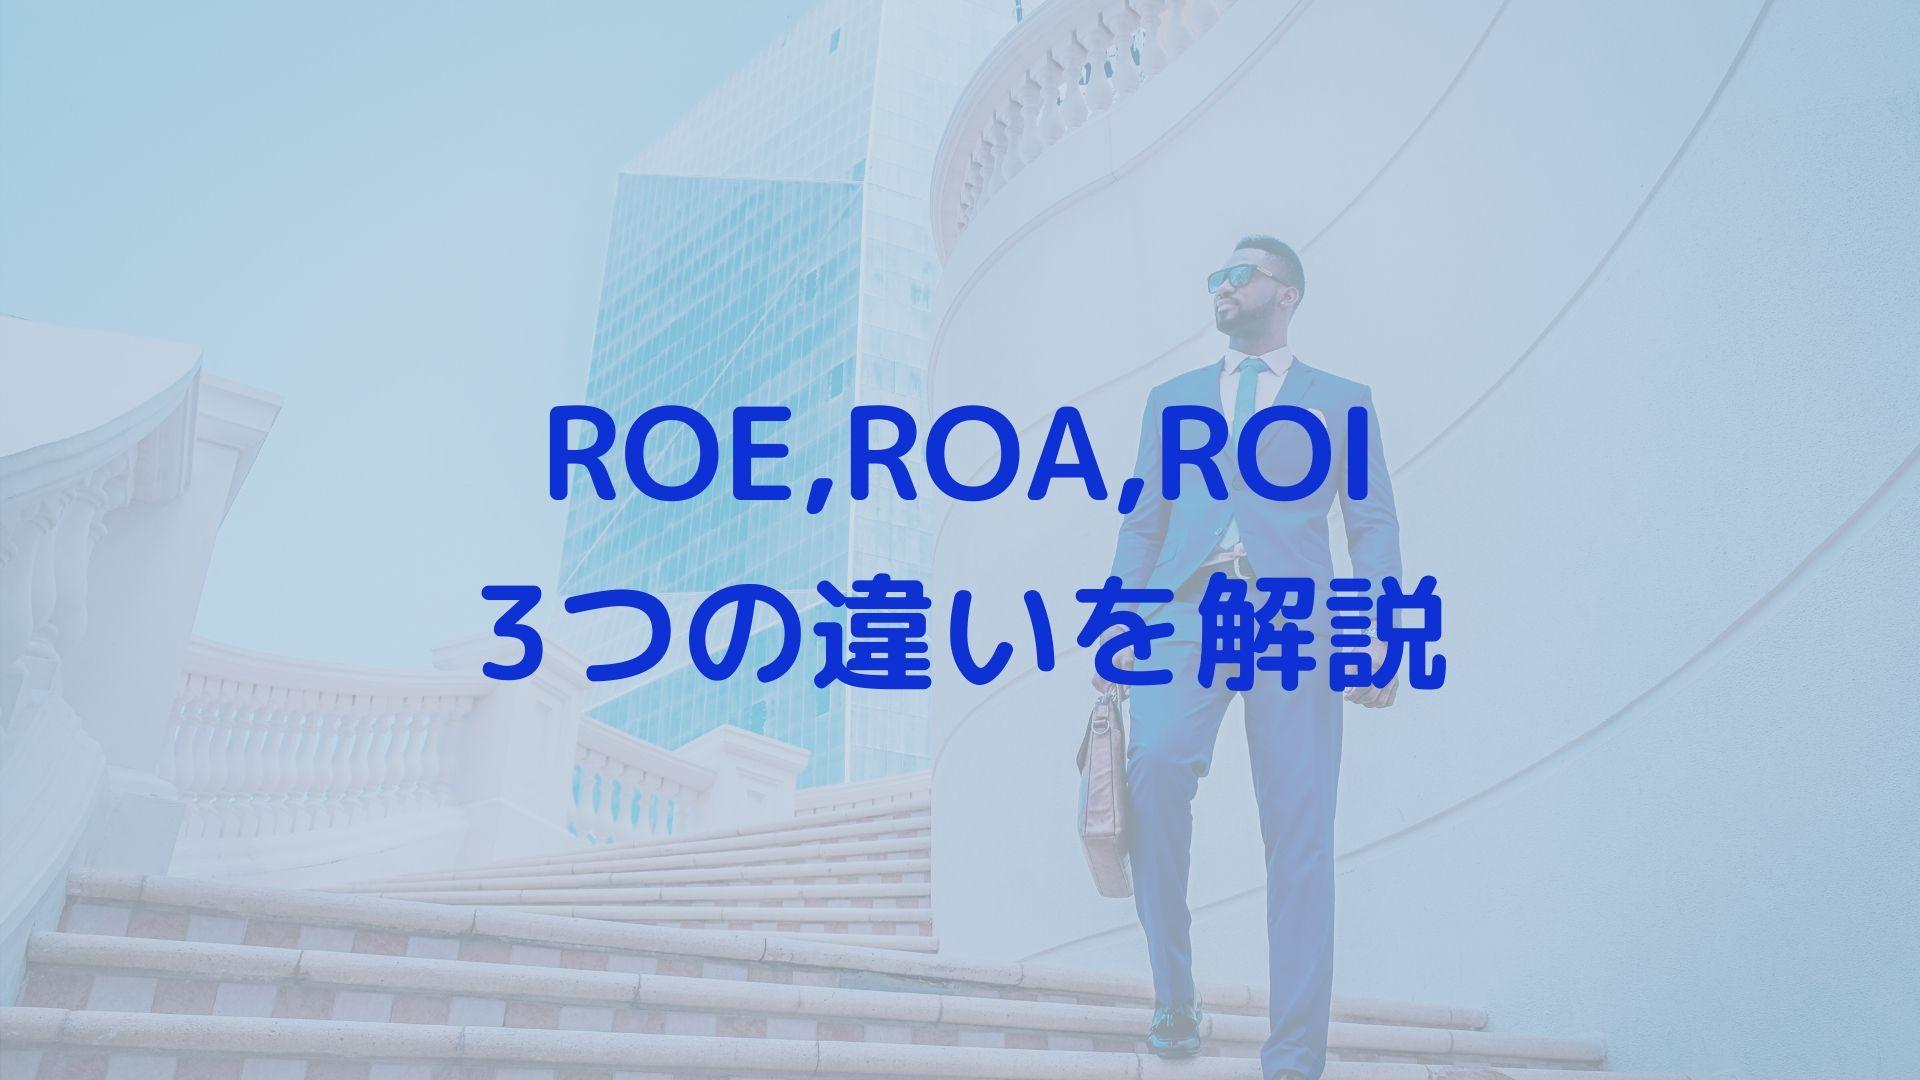 ROE,ROA,ROI